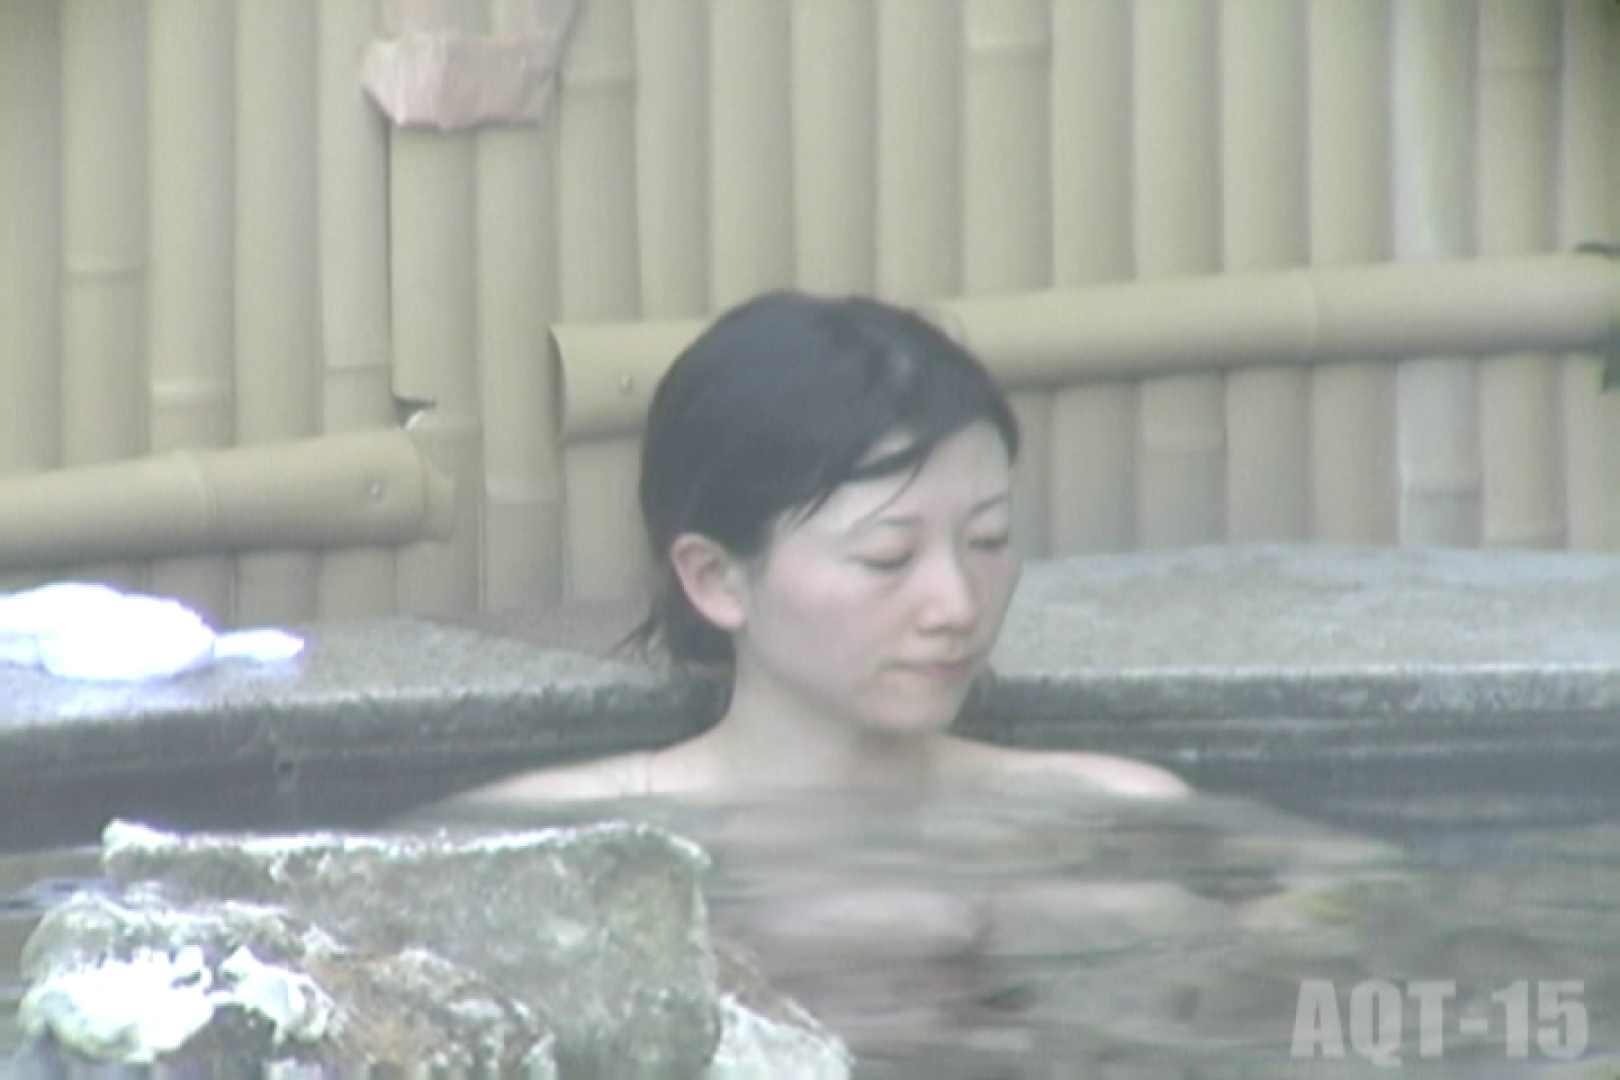 女露天風呂劇場 Vol.20 女湯の中 濡れ場動画紹介 88画像 43